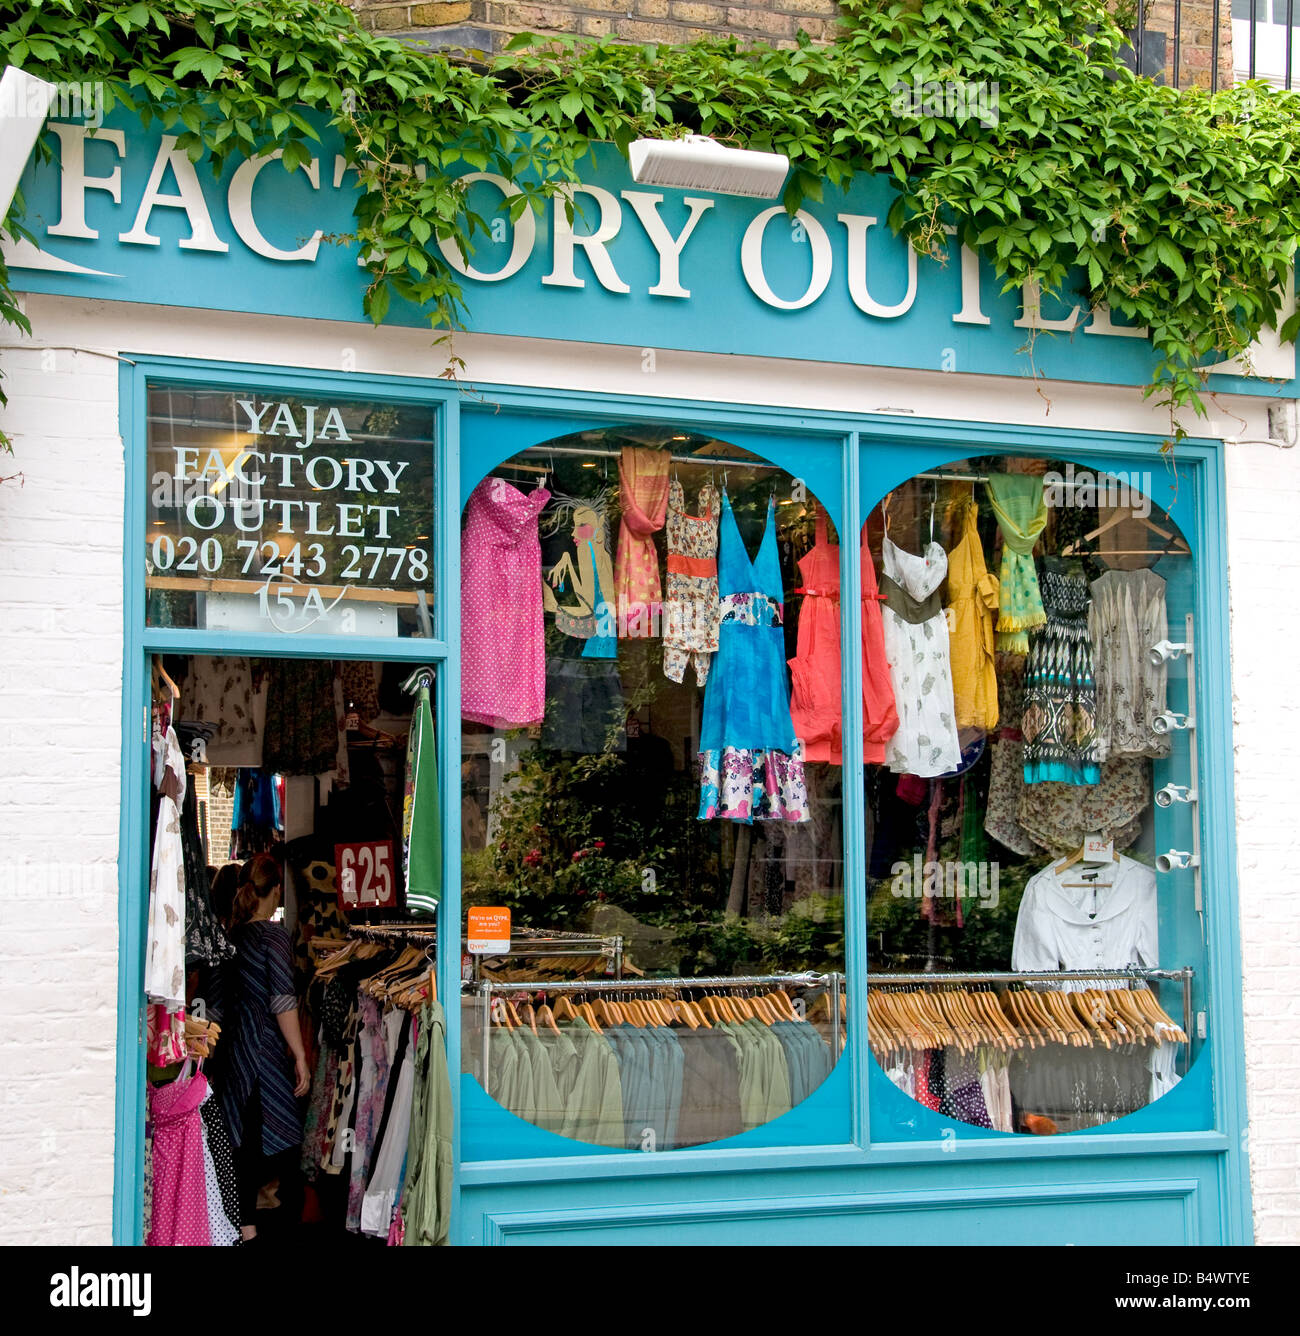 Fashion Portobello Road Market Notting Hill London - Stock Image